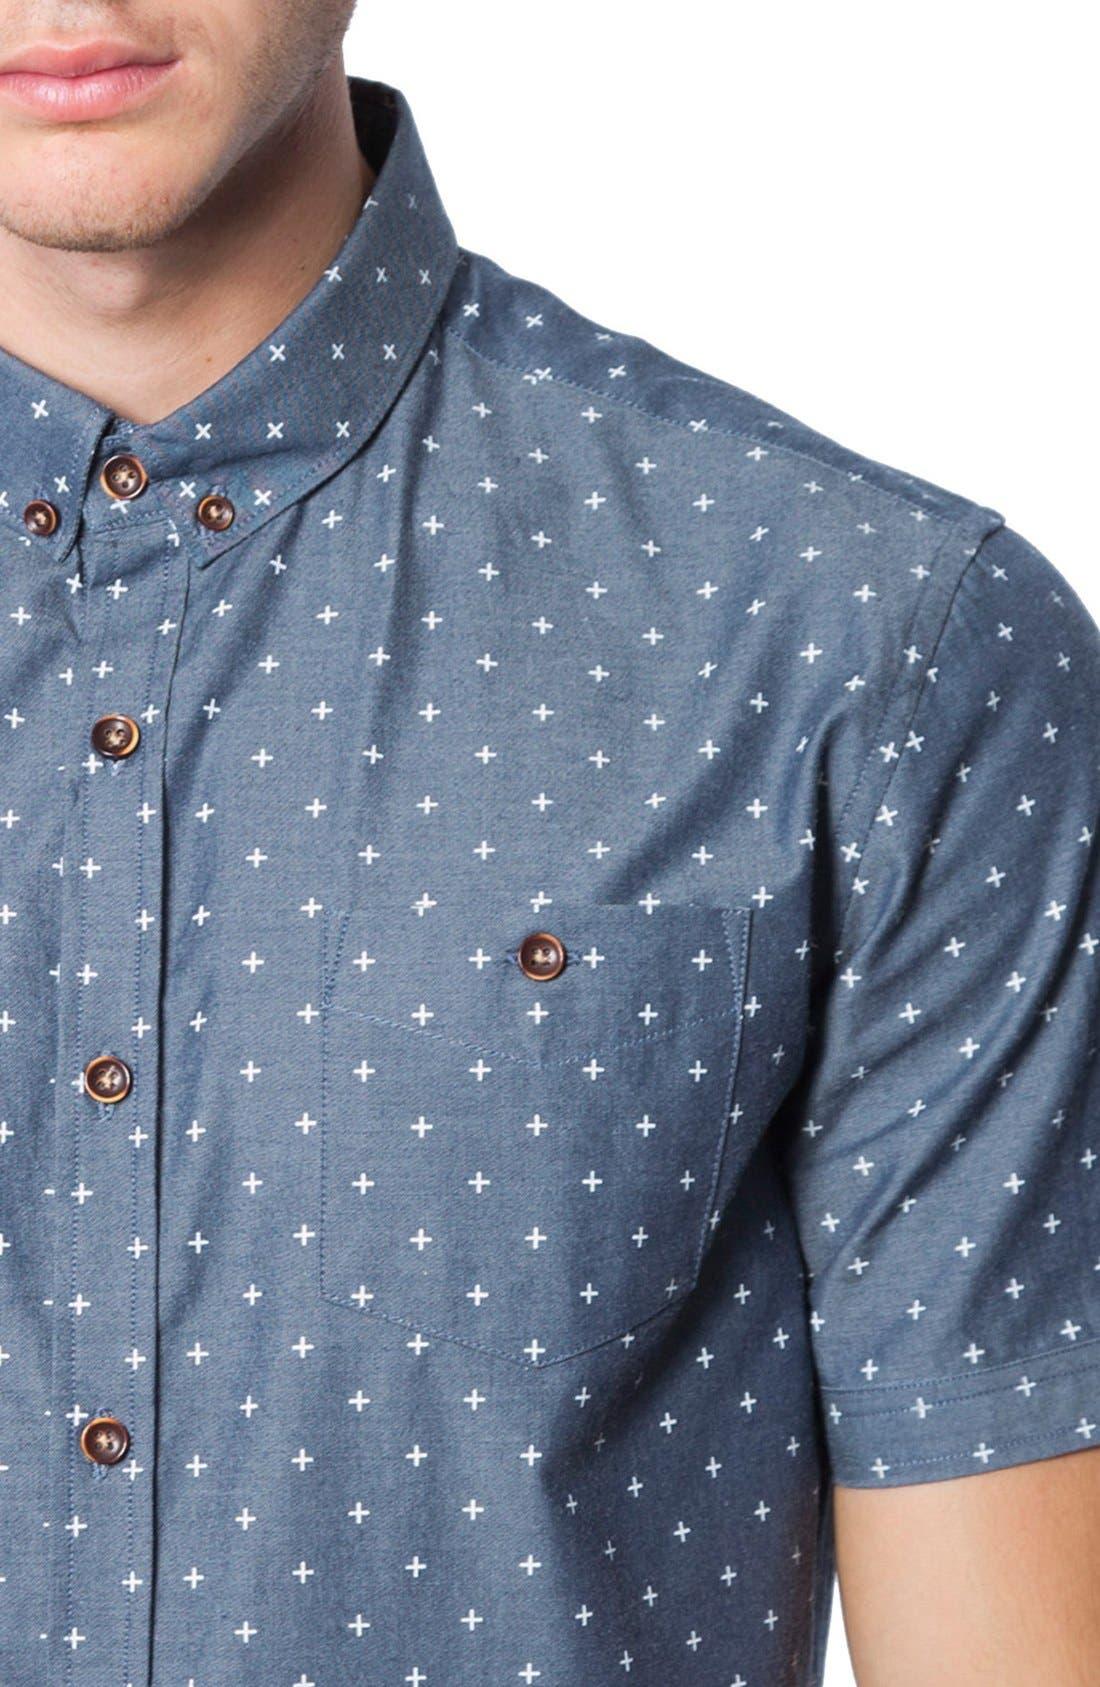 'Habits' Trim Fit Short Sleeve Chambray Shirt,                             Alternate thumbnail 4, color,                             410